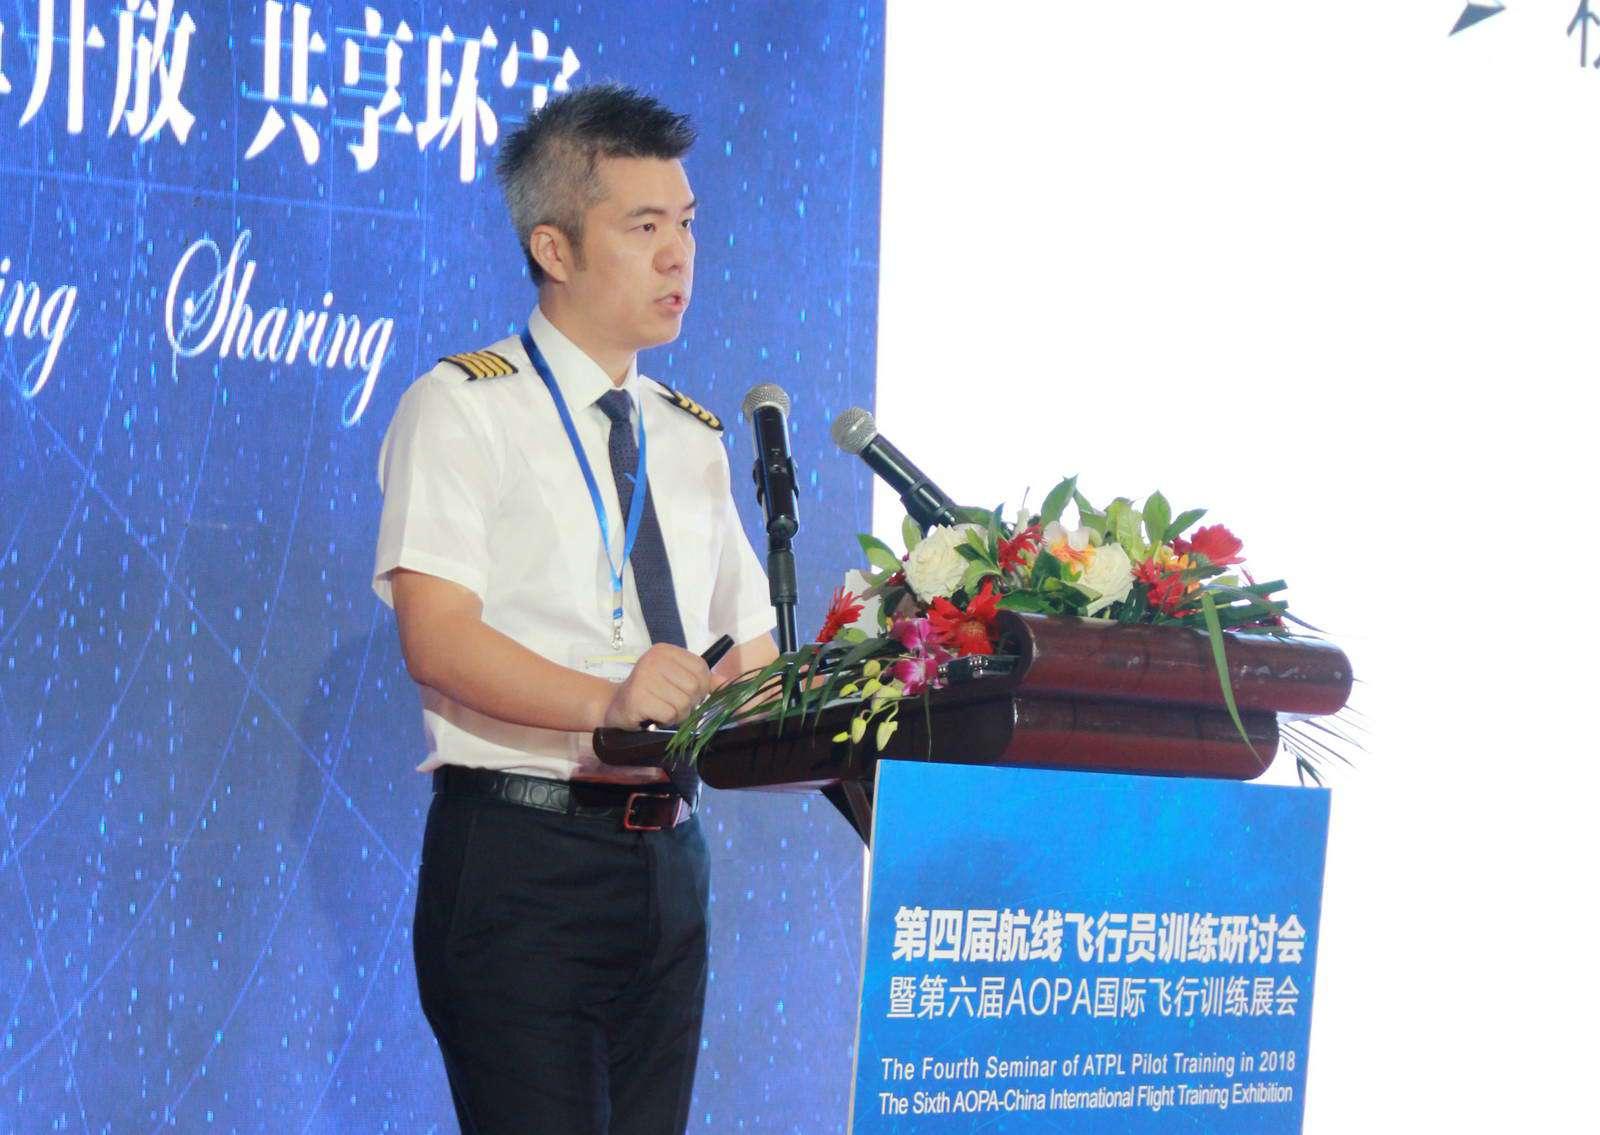 C919首飞机长蔡俊发言